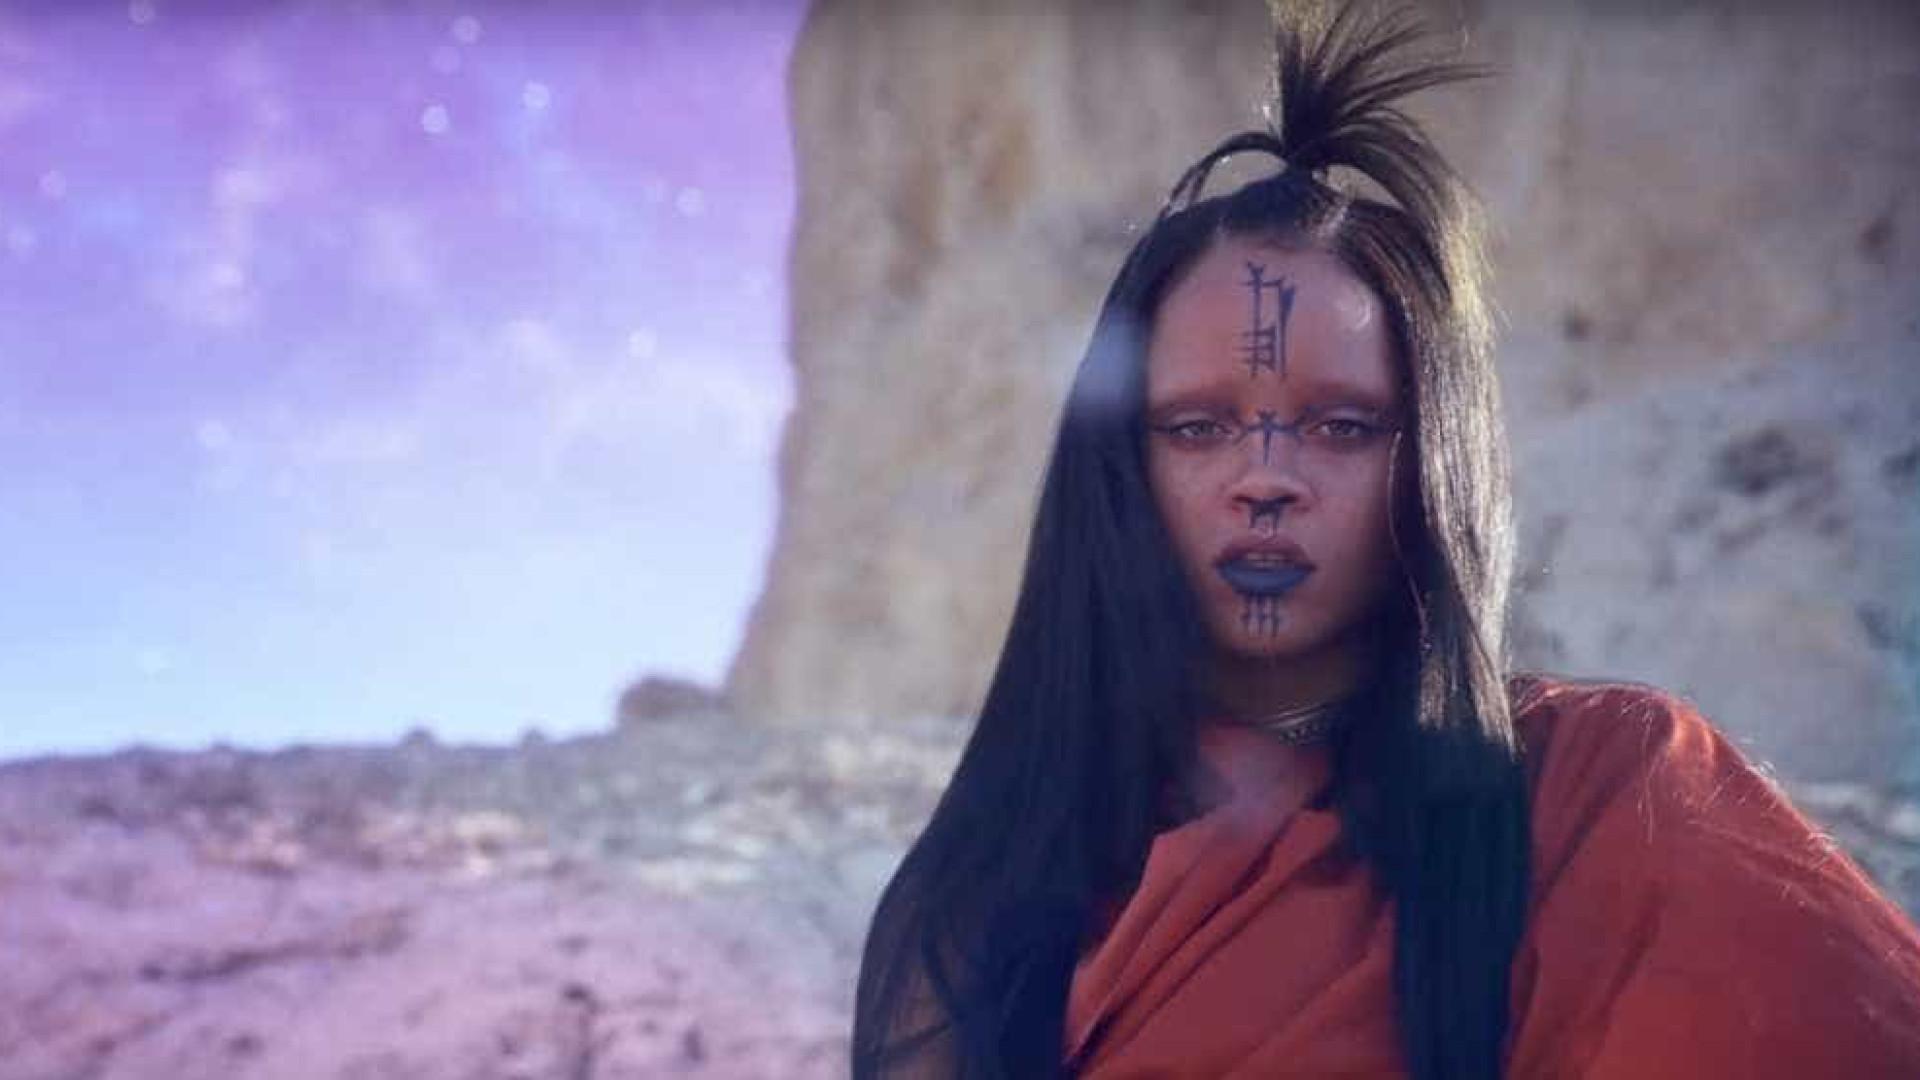 Rihanna lança clipe de Sledghammer nesta quinta (30); confira!